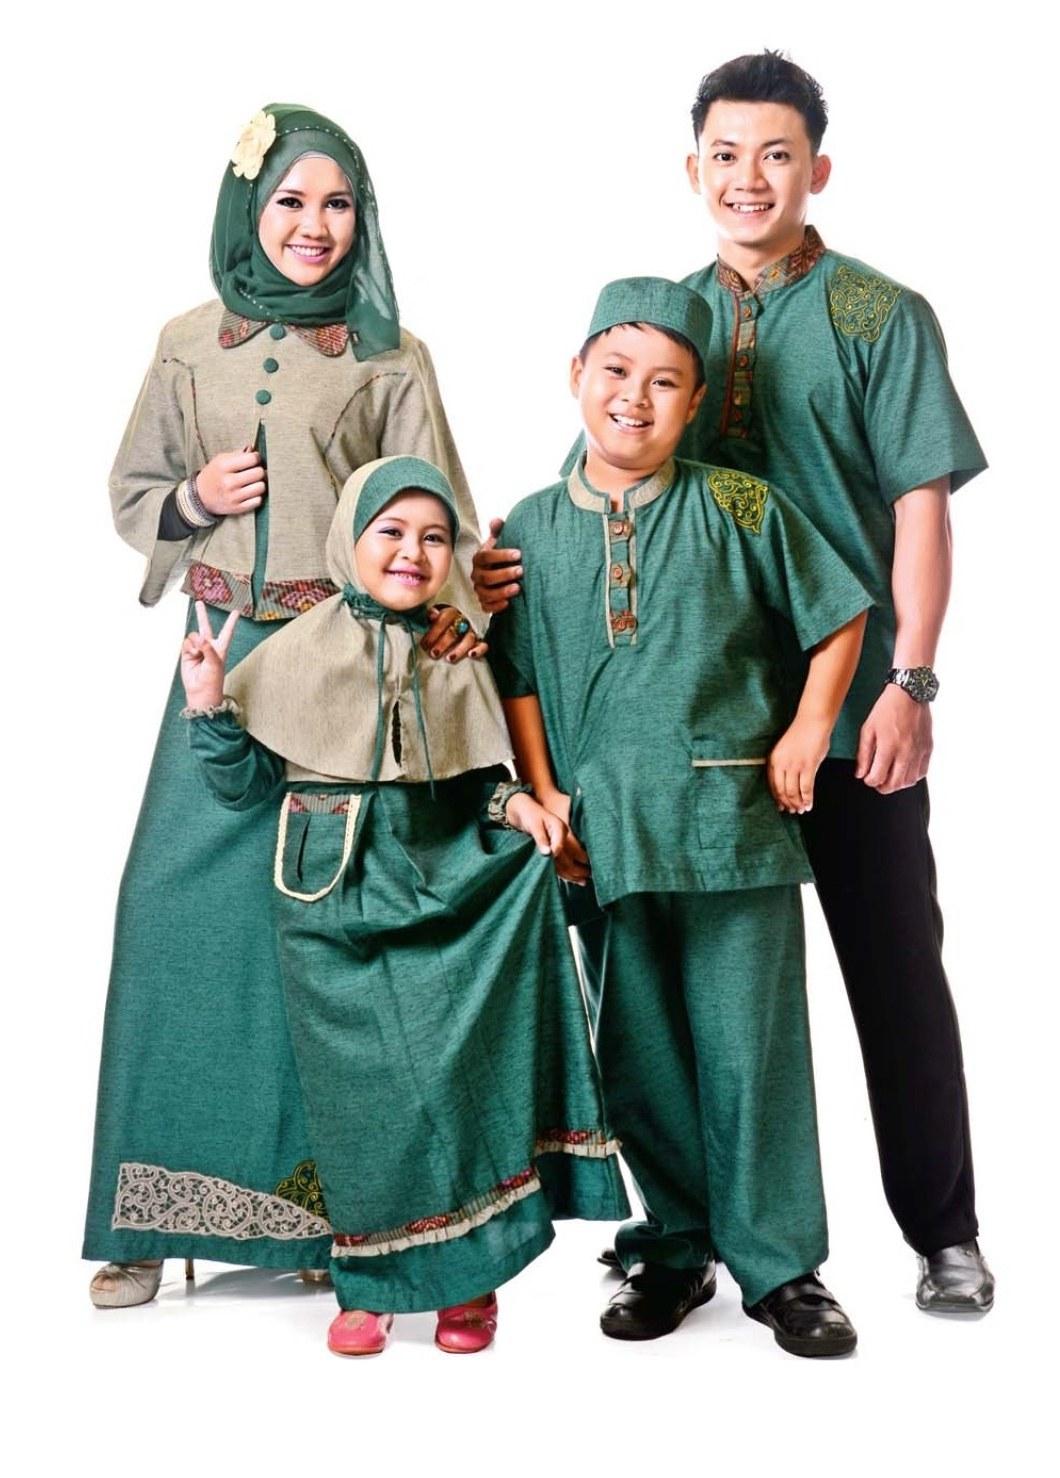 Ide Baju Lebaran Buat Keluarga Nkde Intip 7 Ide Kado Lebaran Untuk orang Tersayang Di Sini Yuk